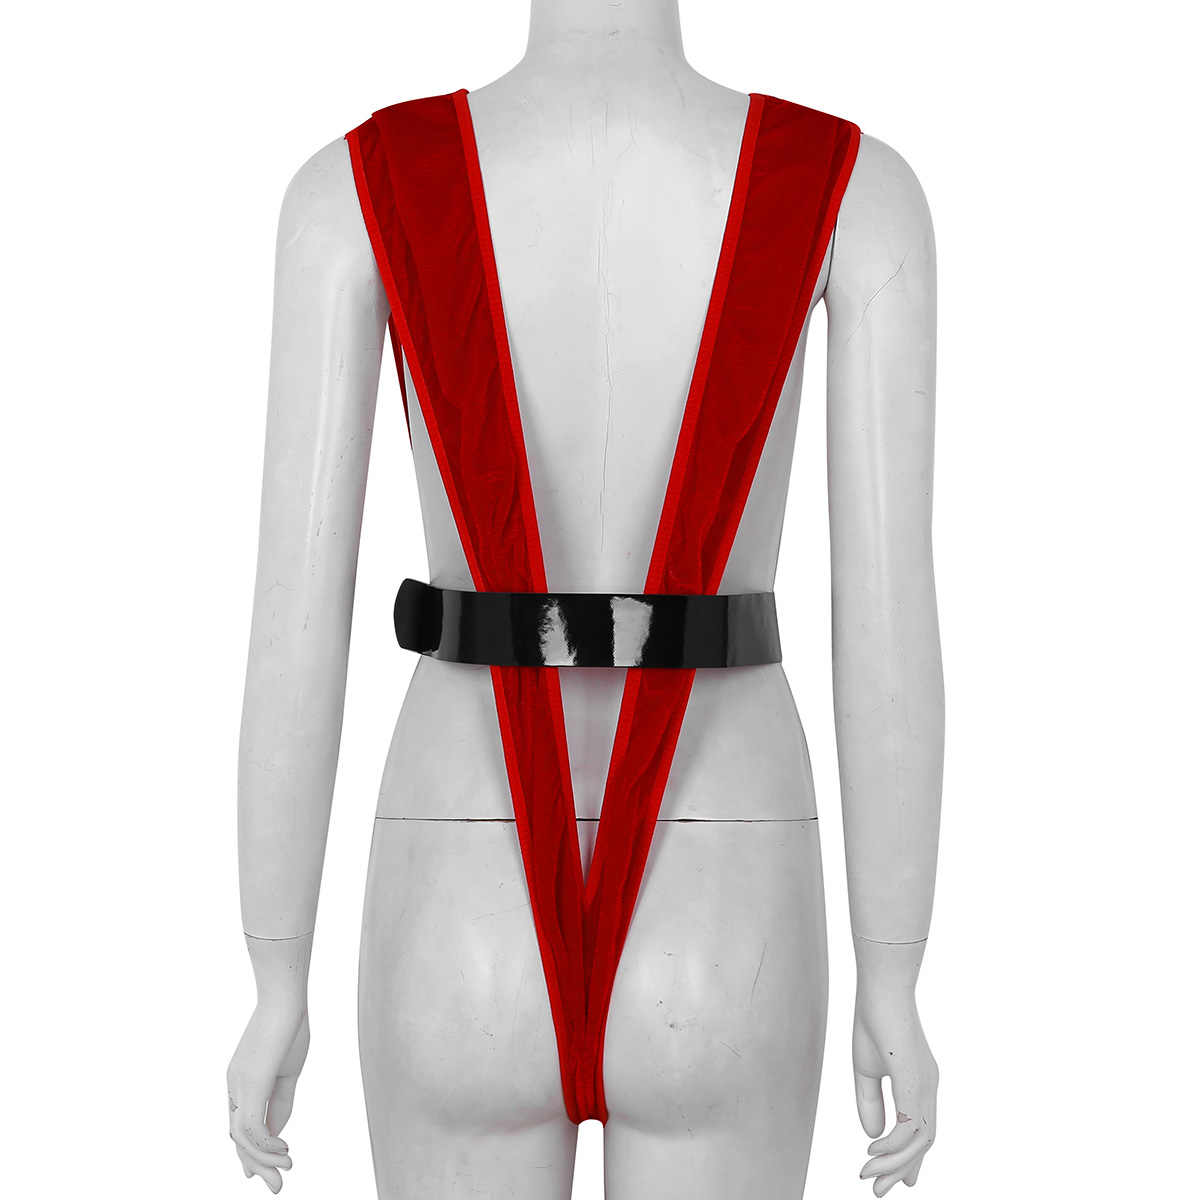 c45c0bc2410 ... Women Deep V Neck Bodysuit Red One Piece Swimsuit Lady Soft Velvet Sexy  Thong Santa Exposure ...